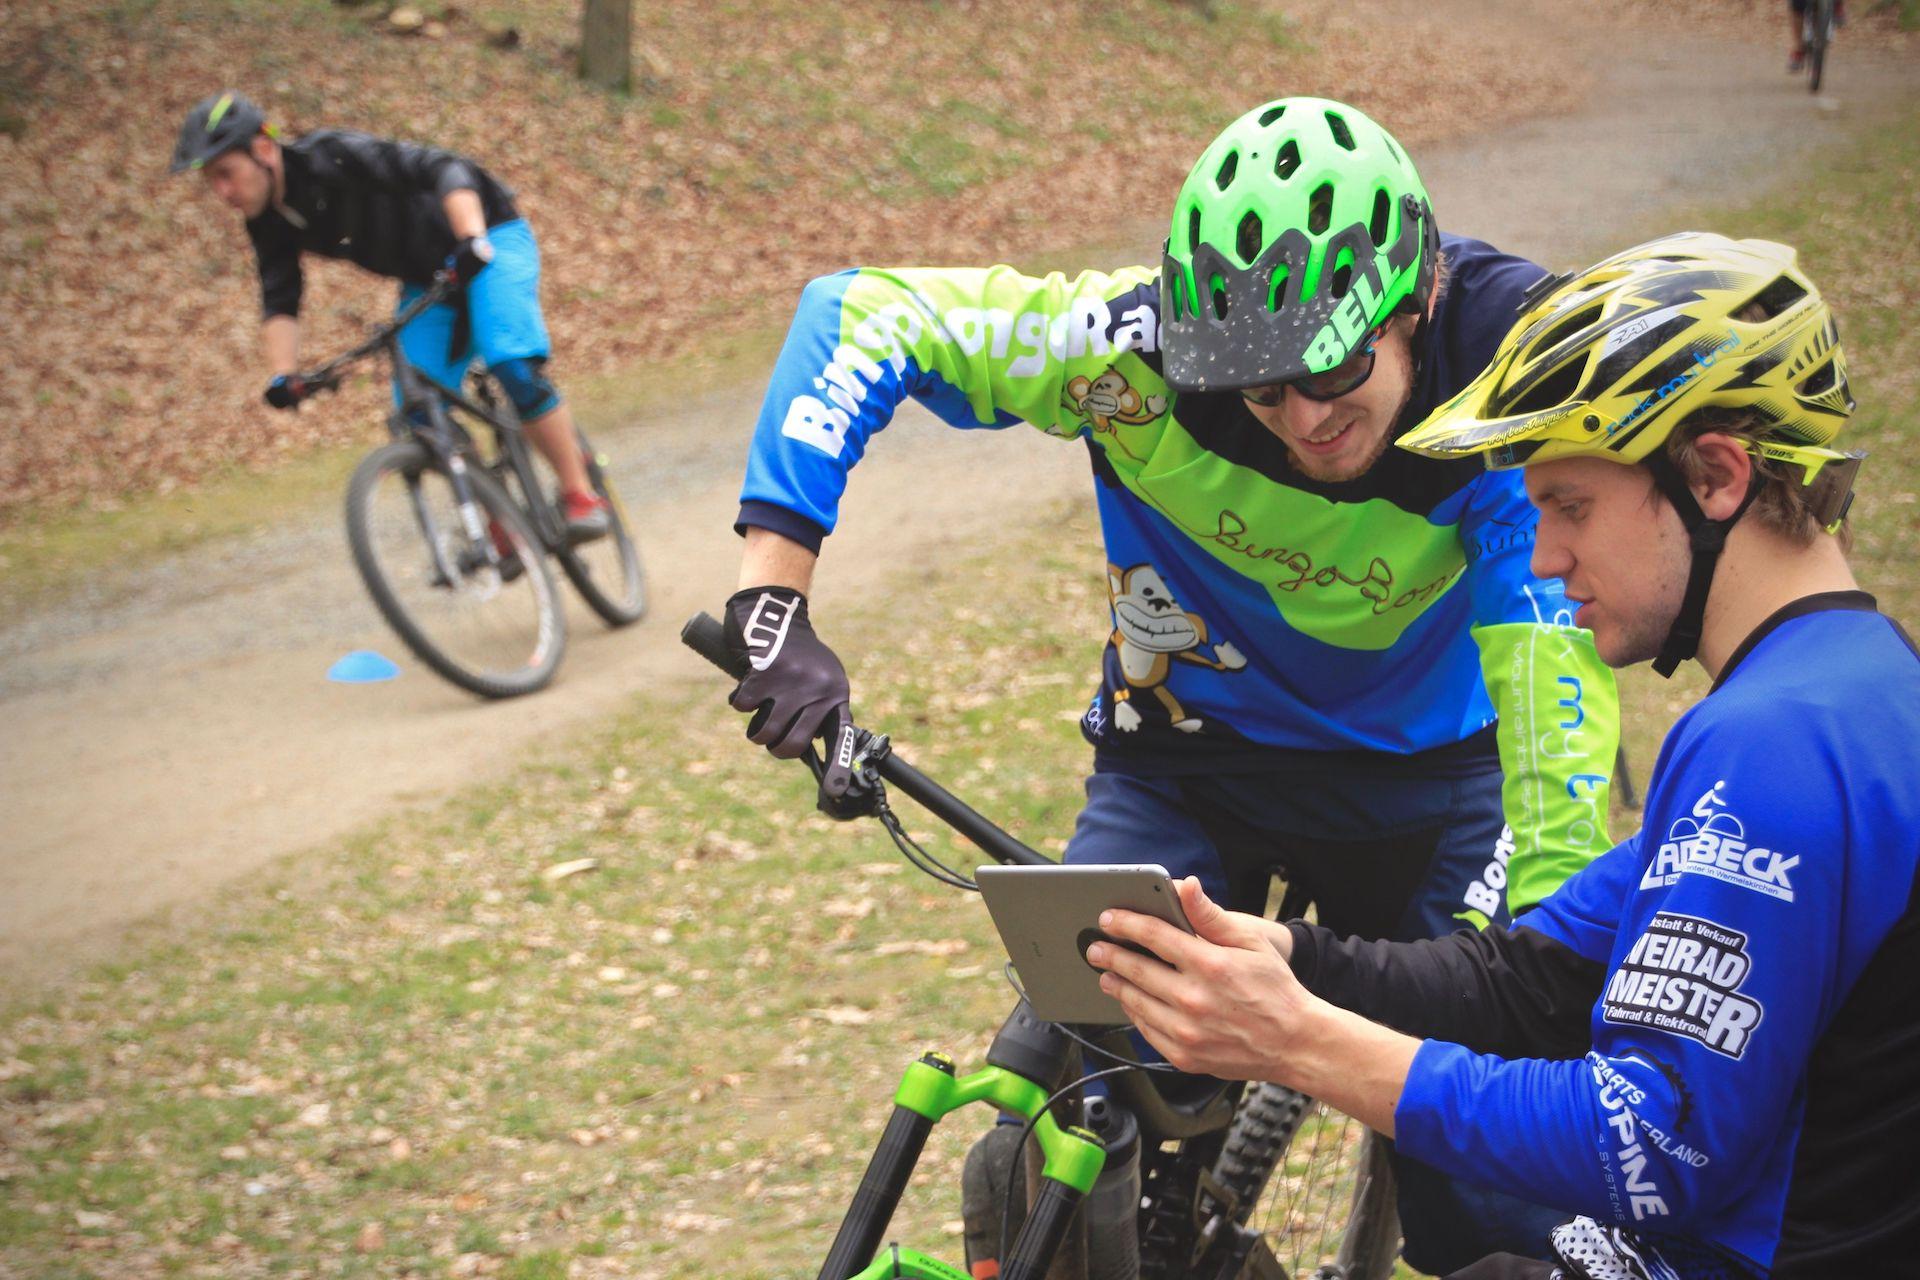 MTB eBike Fahrtechnik Kurse in Hessen Training Trails Einsteiger Fortgeschritten Experte Rock my Trail Bikeschule